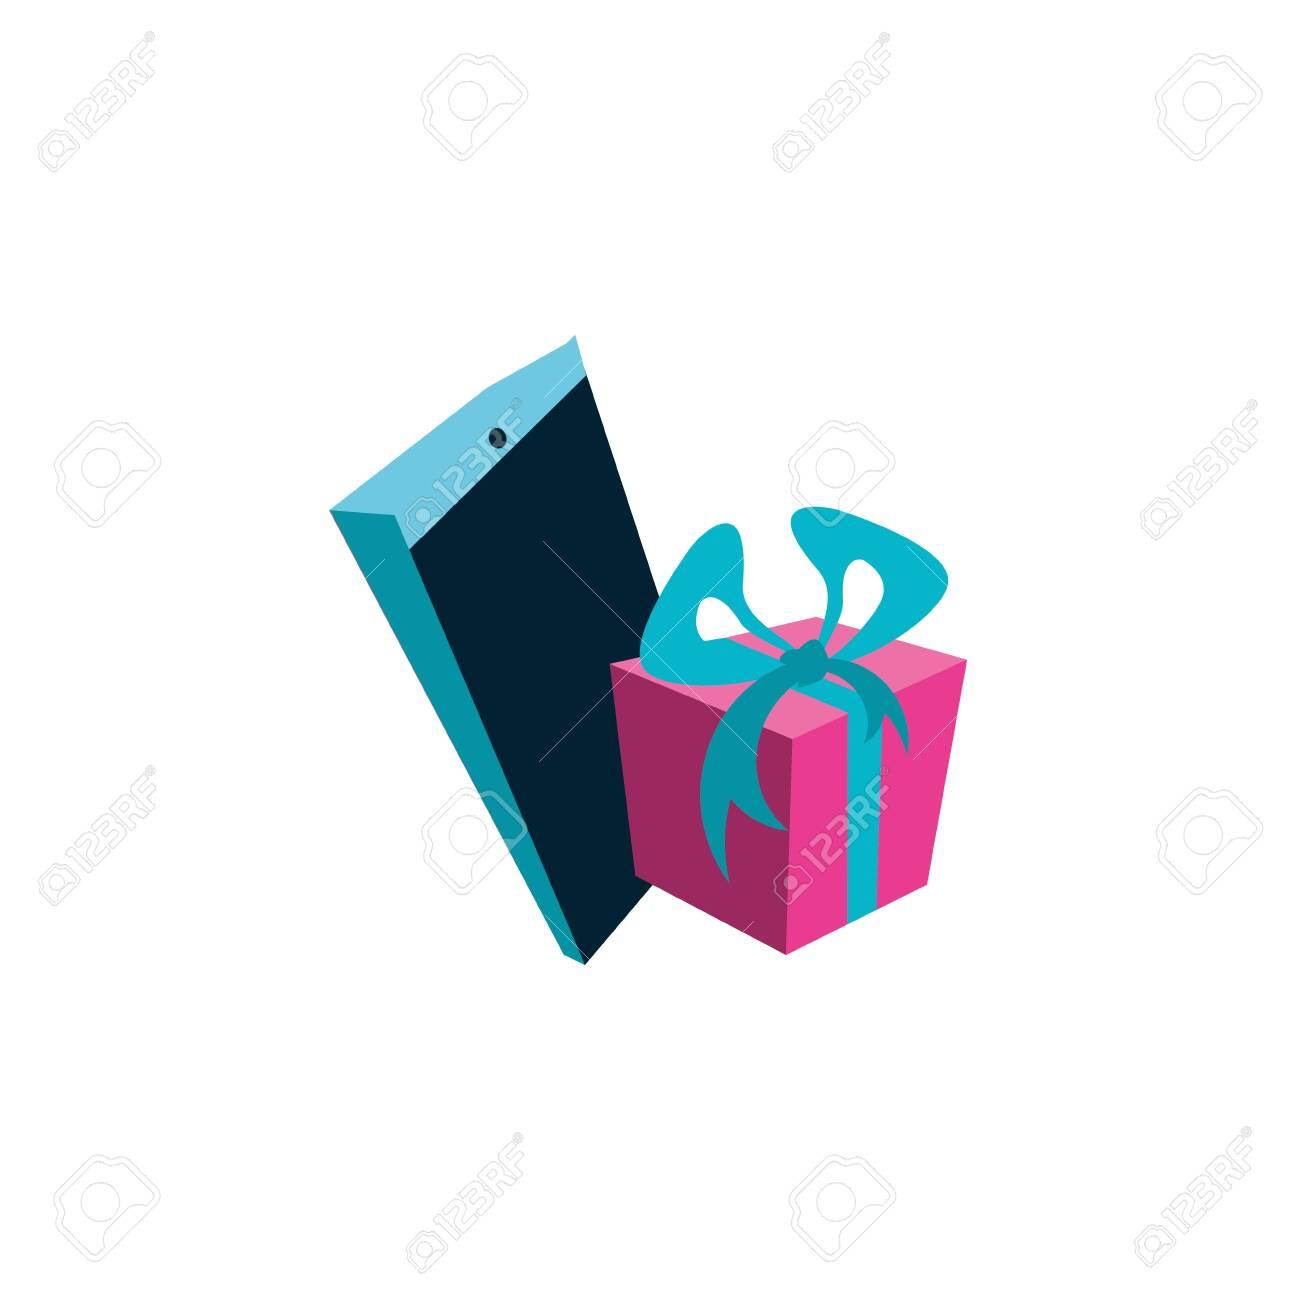 Smartphone Device With Gift Box Vector Illustration Design Royalty Free Klipartlar Vektor Cizimler Ve Stok Cizim Image 145091155